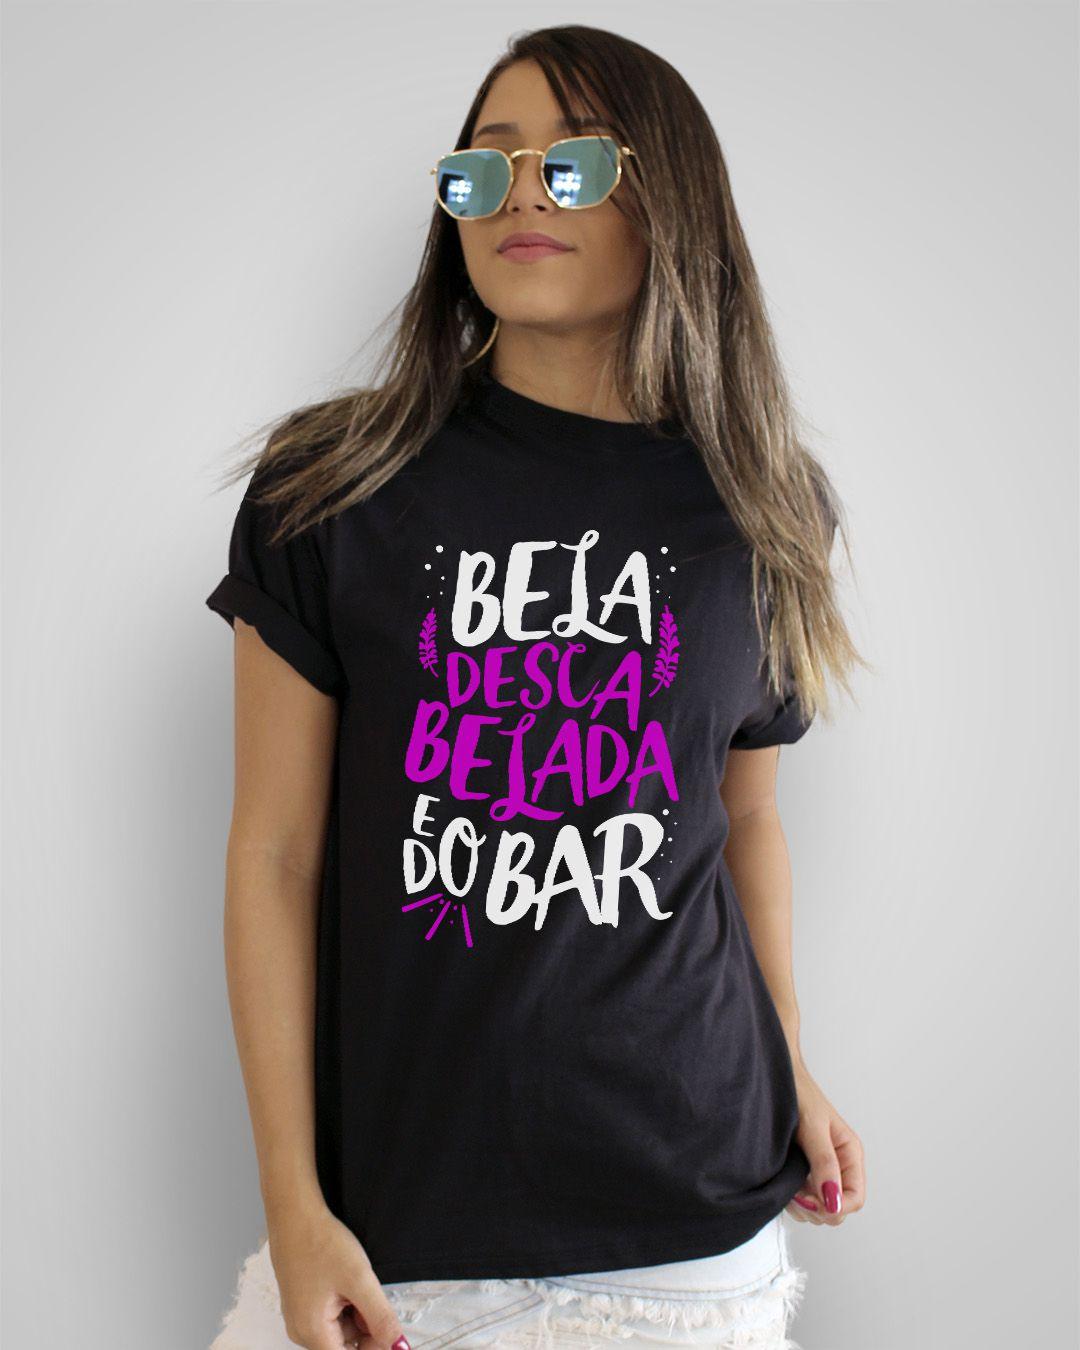 Camiseta Bela, descabelada e do bar